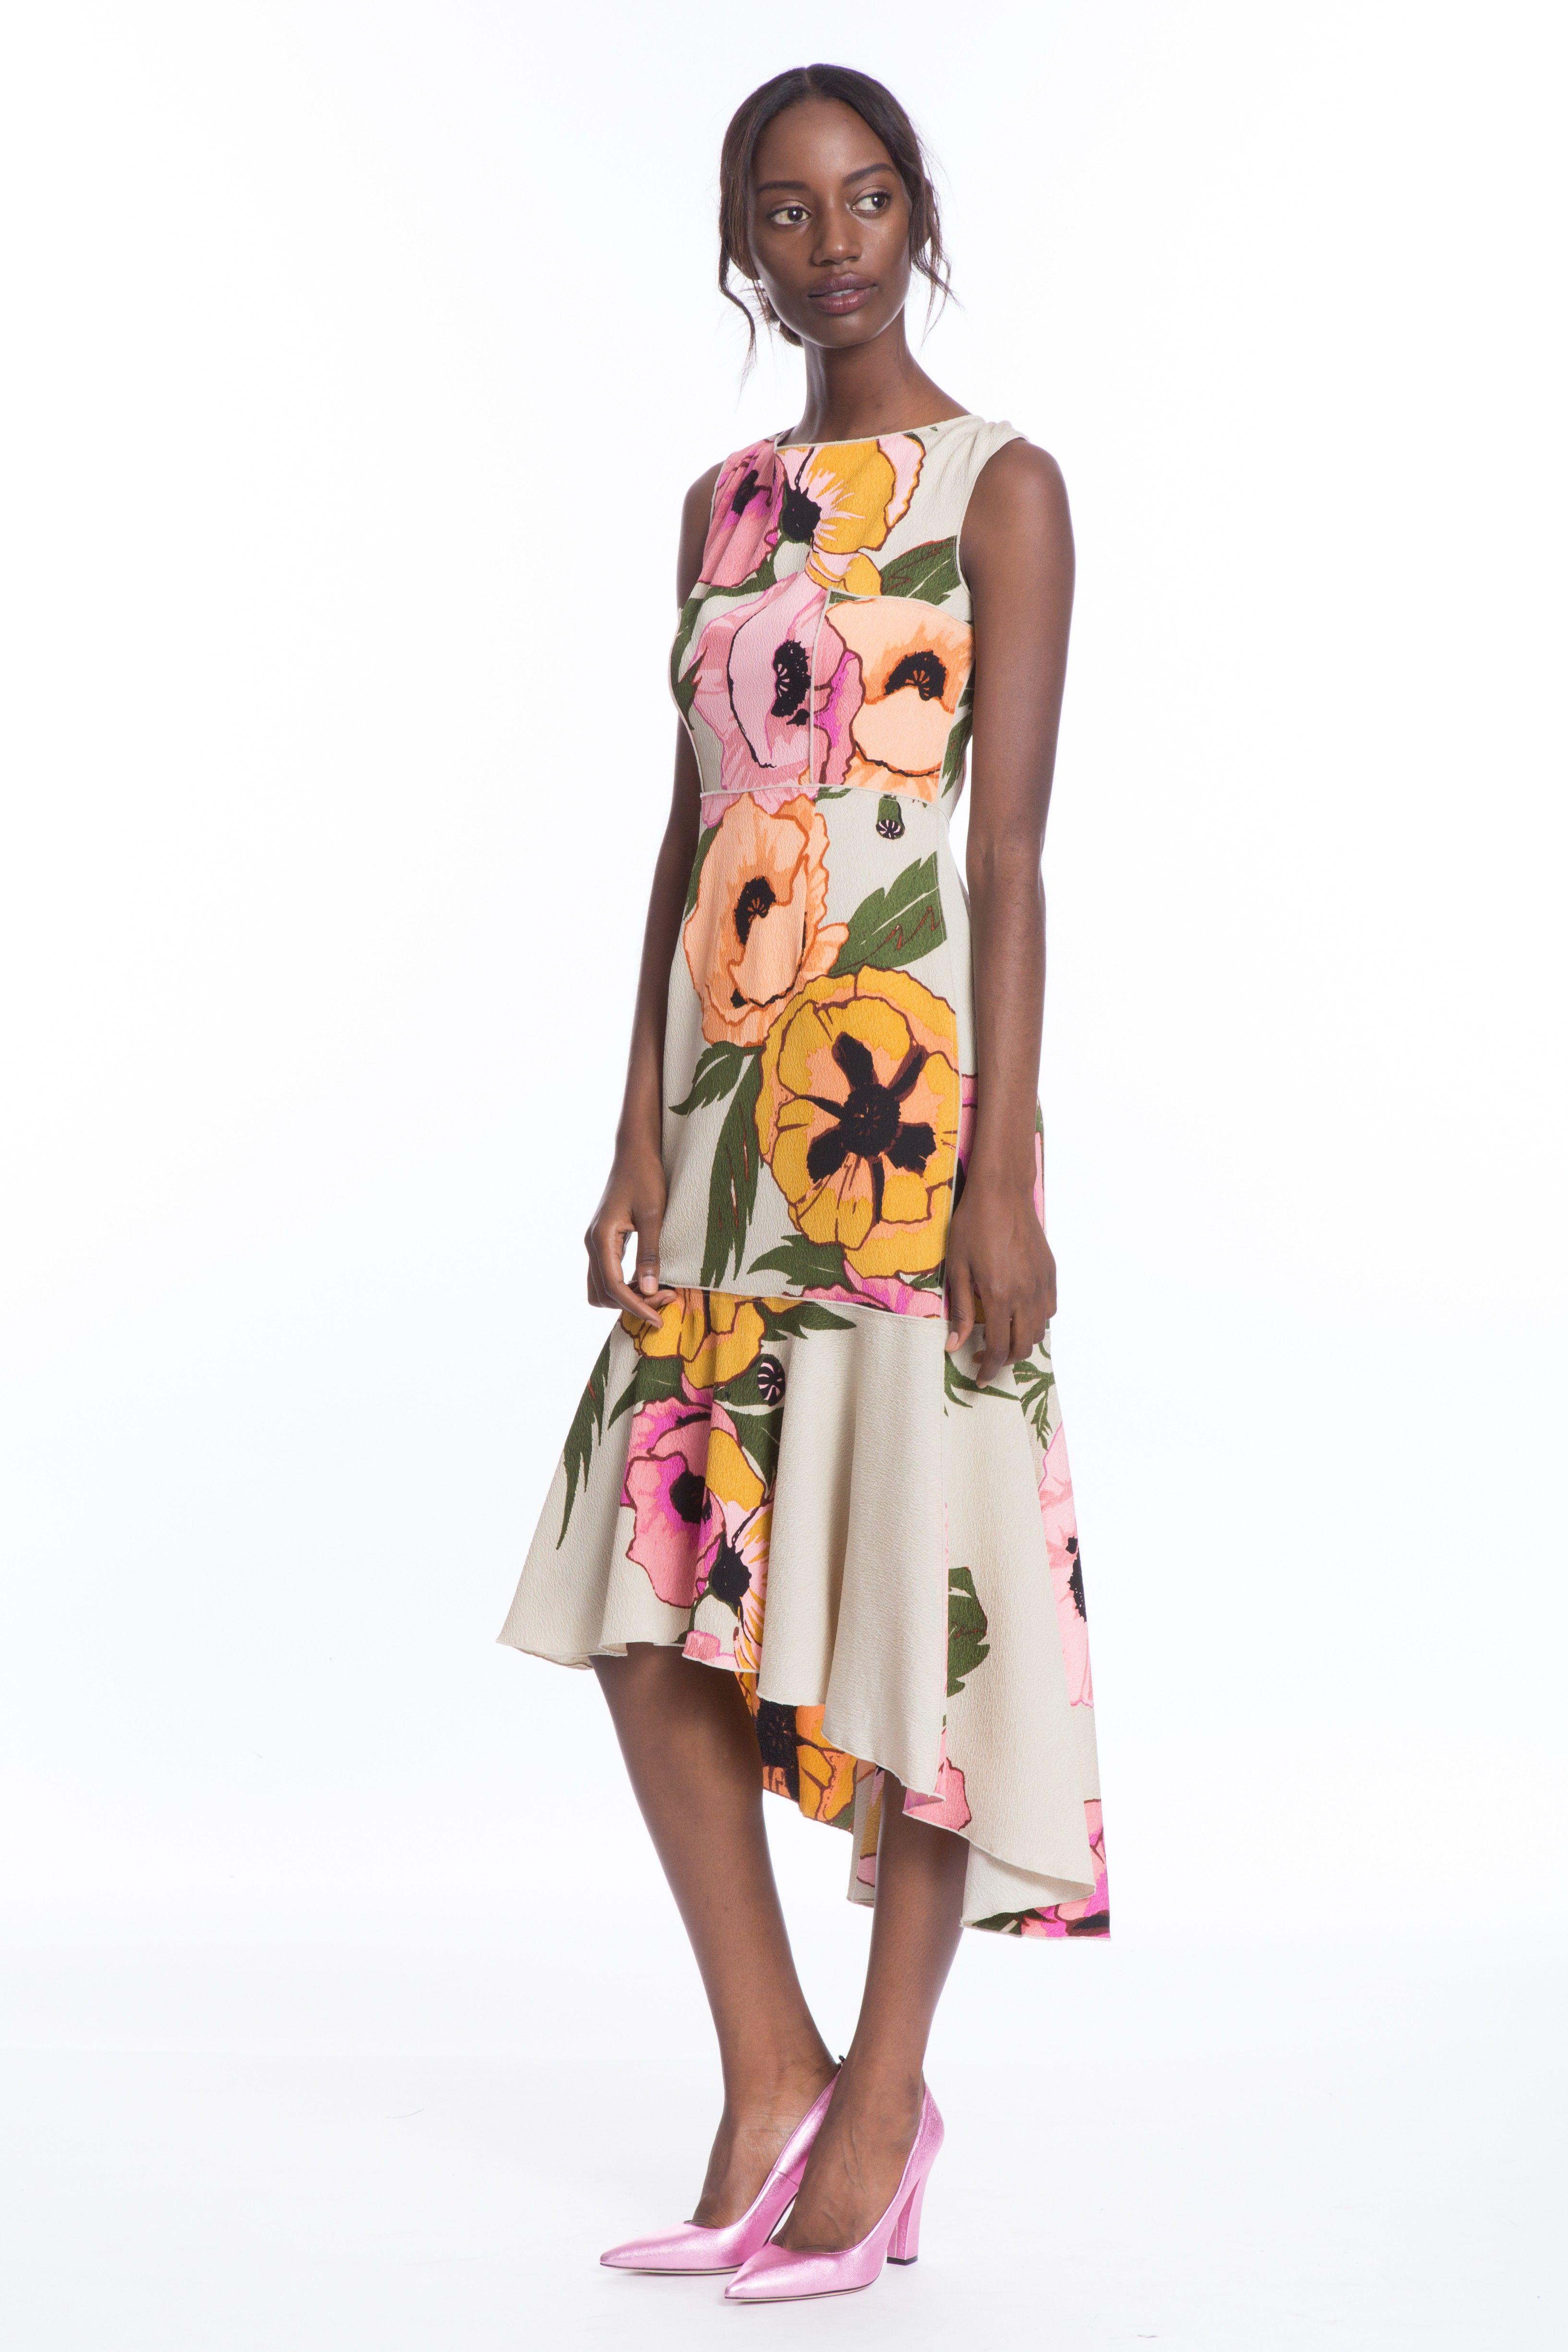 8a5daa6013b8 High Low Frock   Wish List   Summer dresses, Dresses, Frocks